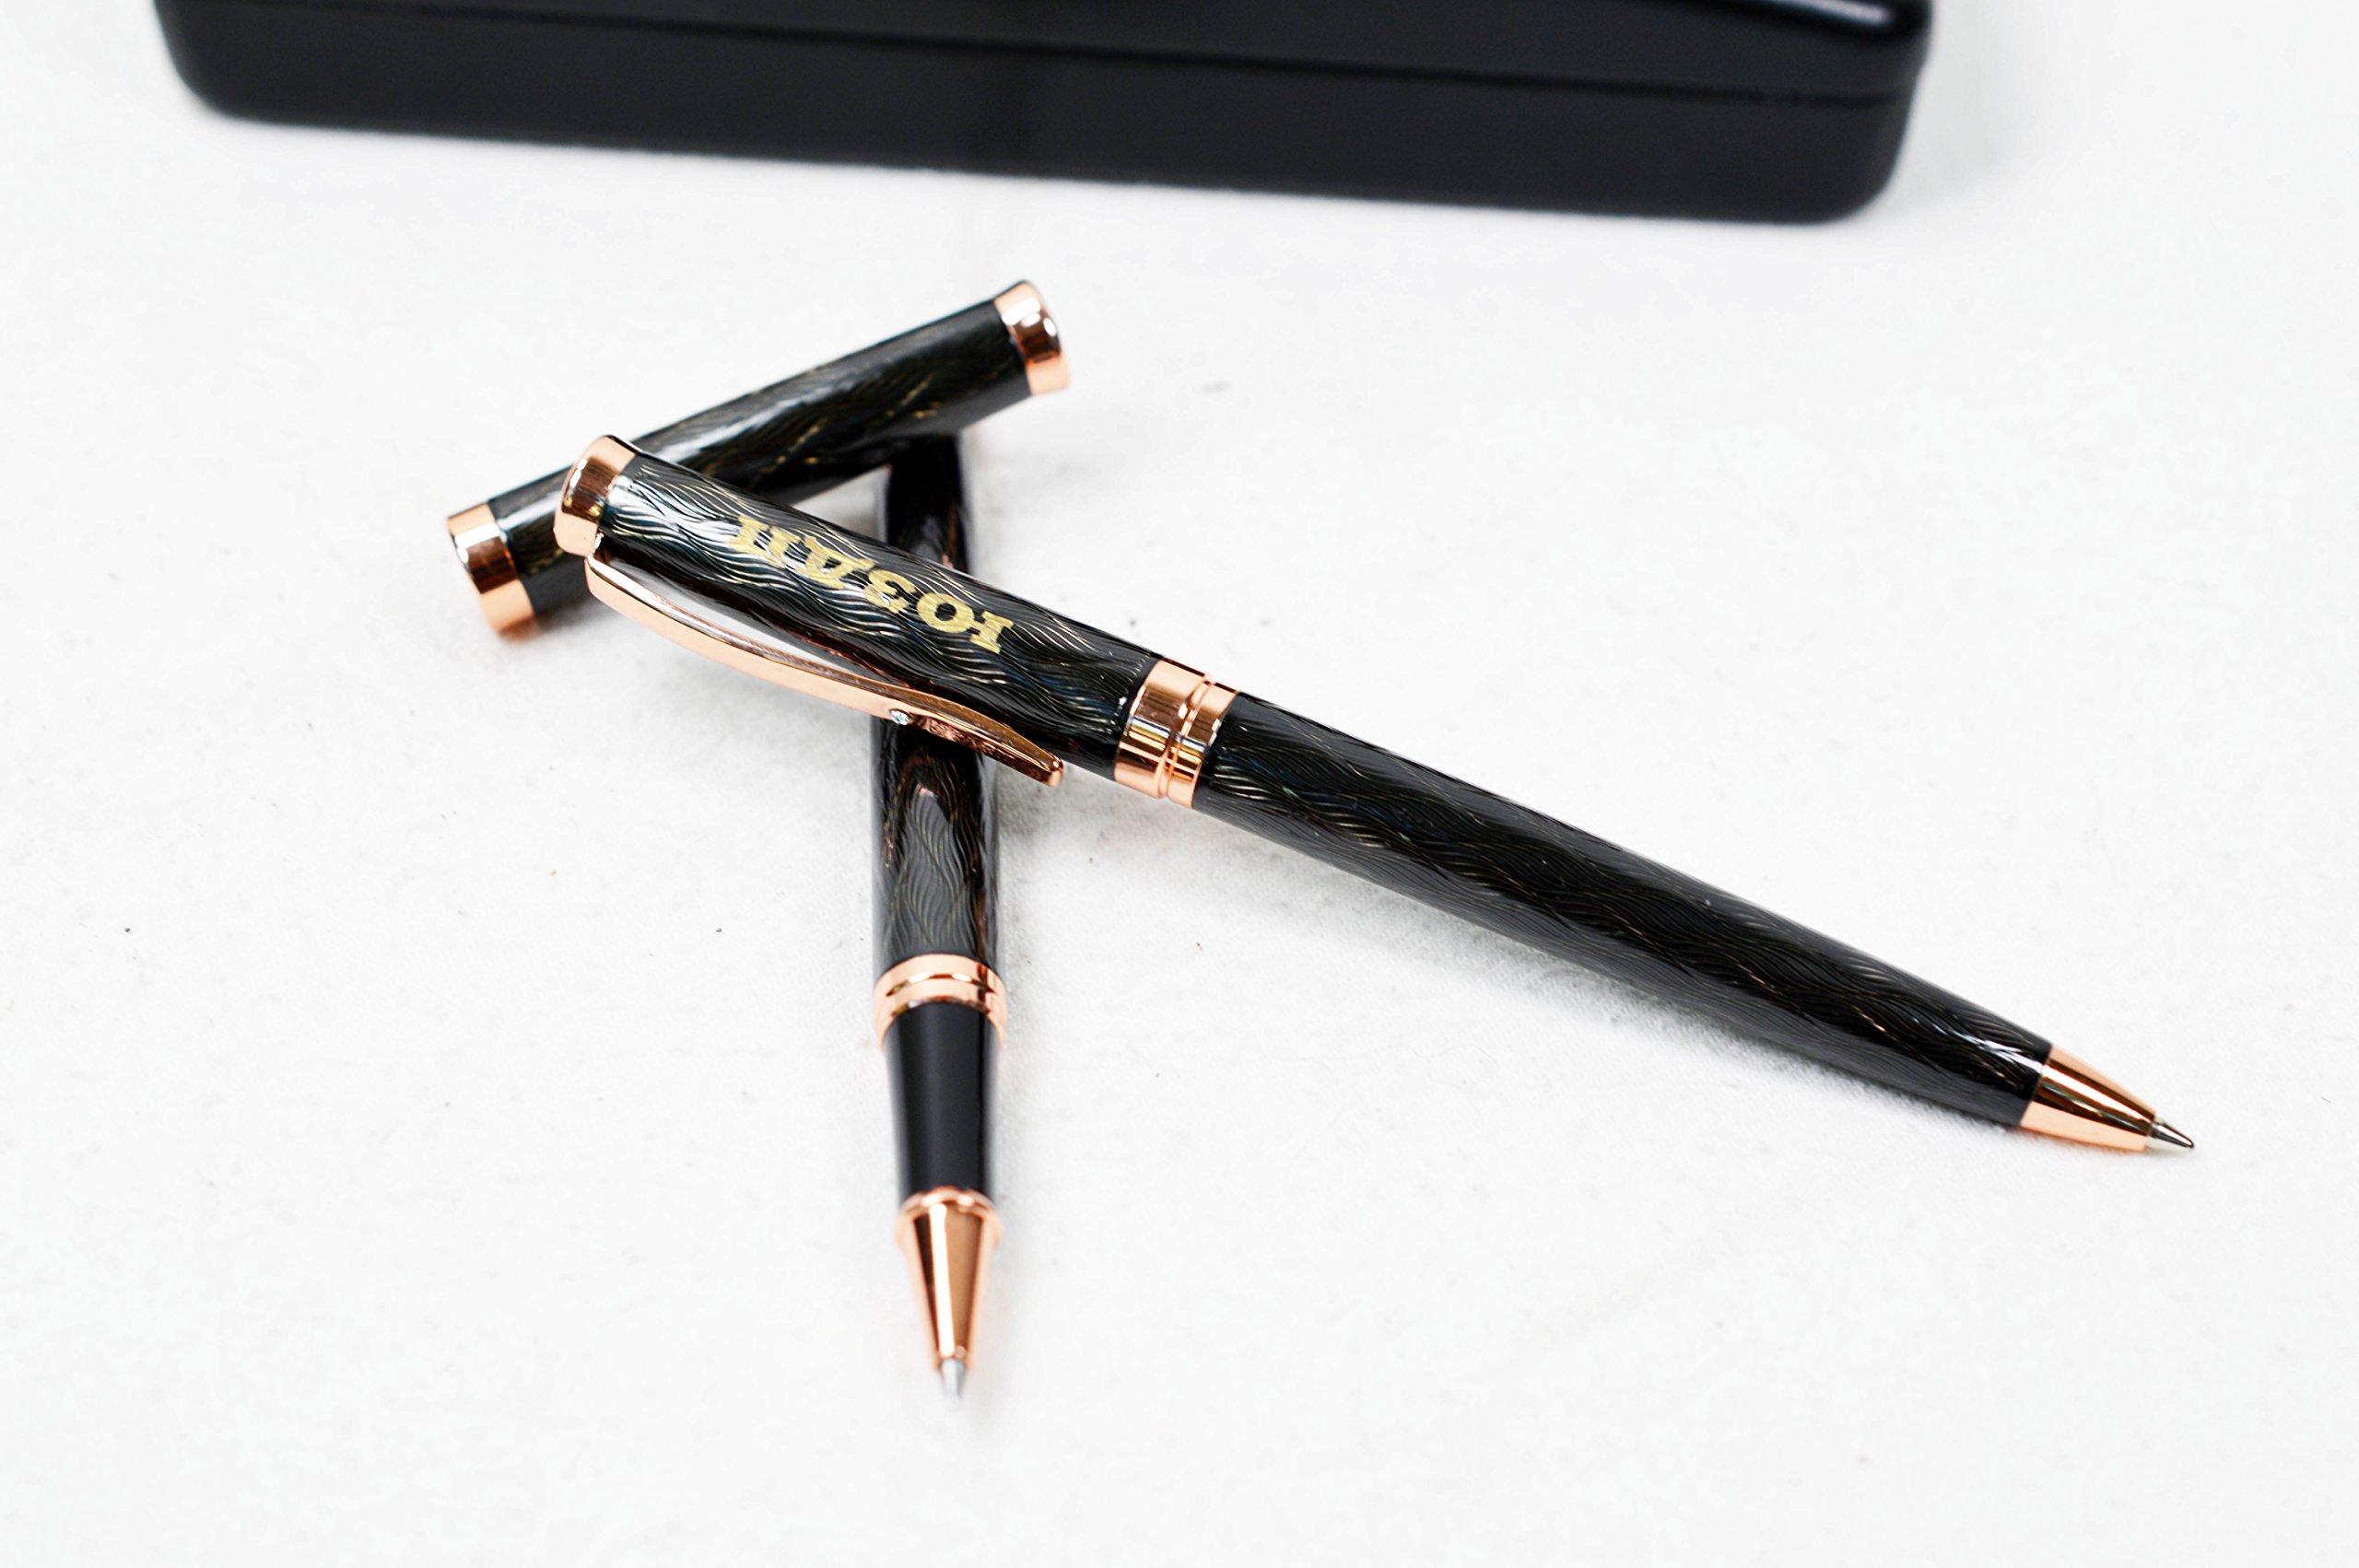 Amazon.com : Vintage pen Engineer pen Writer pen Ink pen Office pen CEO pen  Writing pen Vintage pen set Guest book pen Wedding pen Pen lover : Office  Products